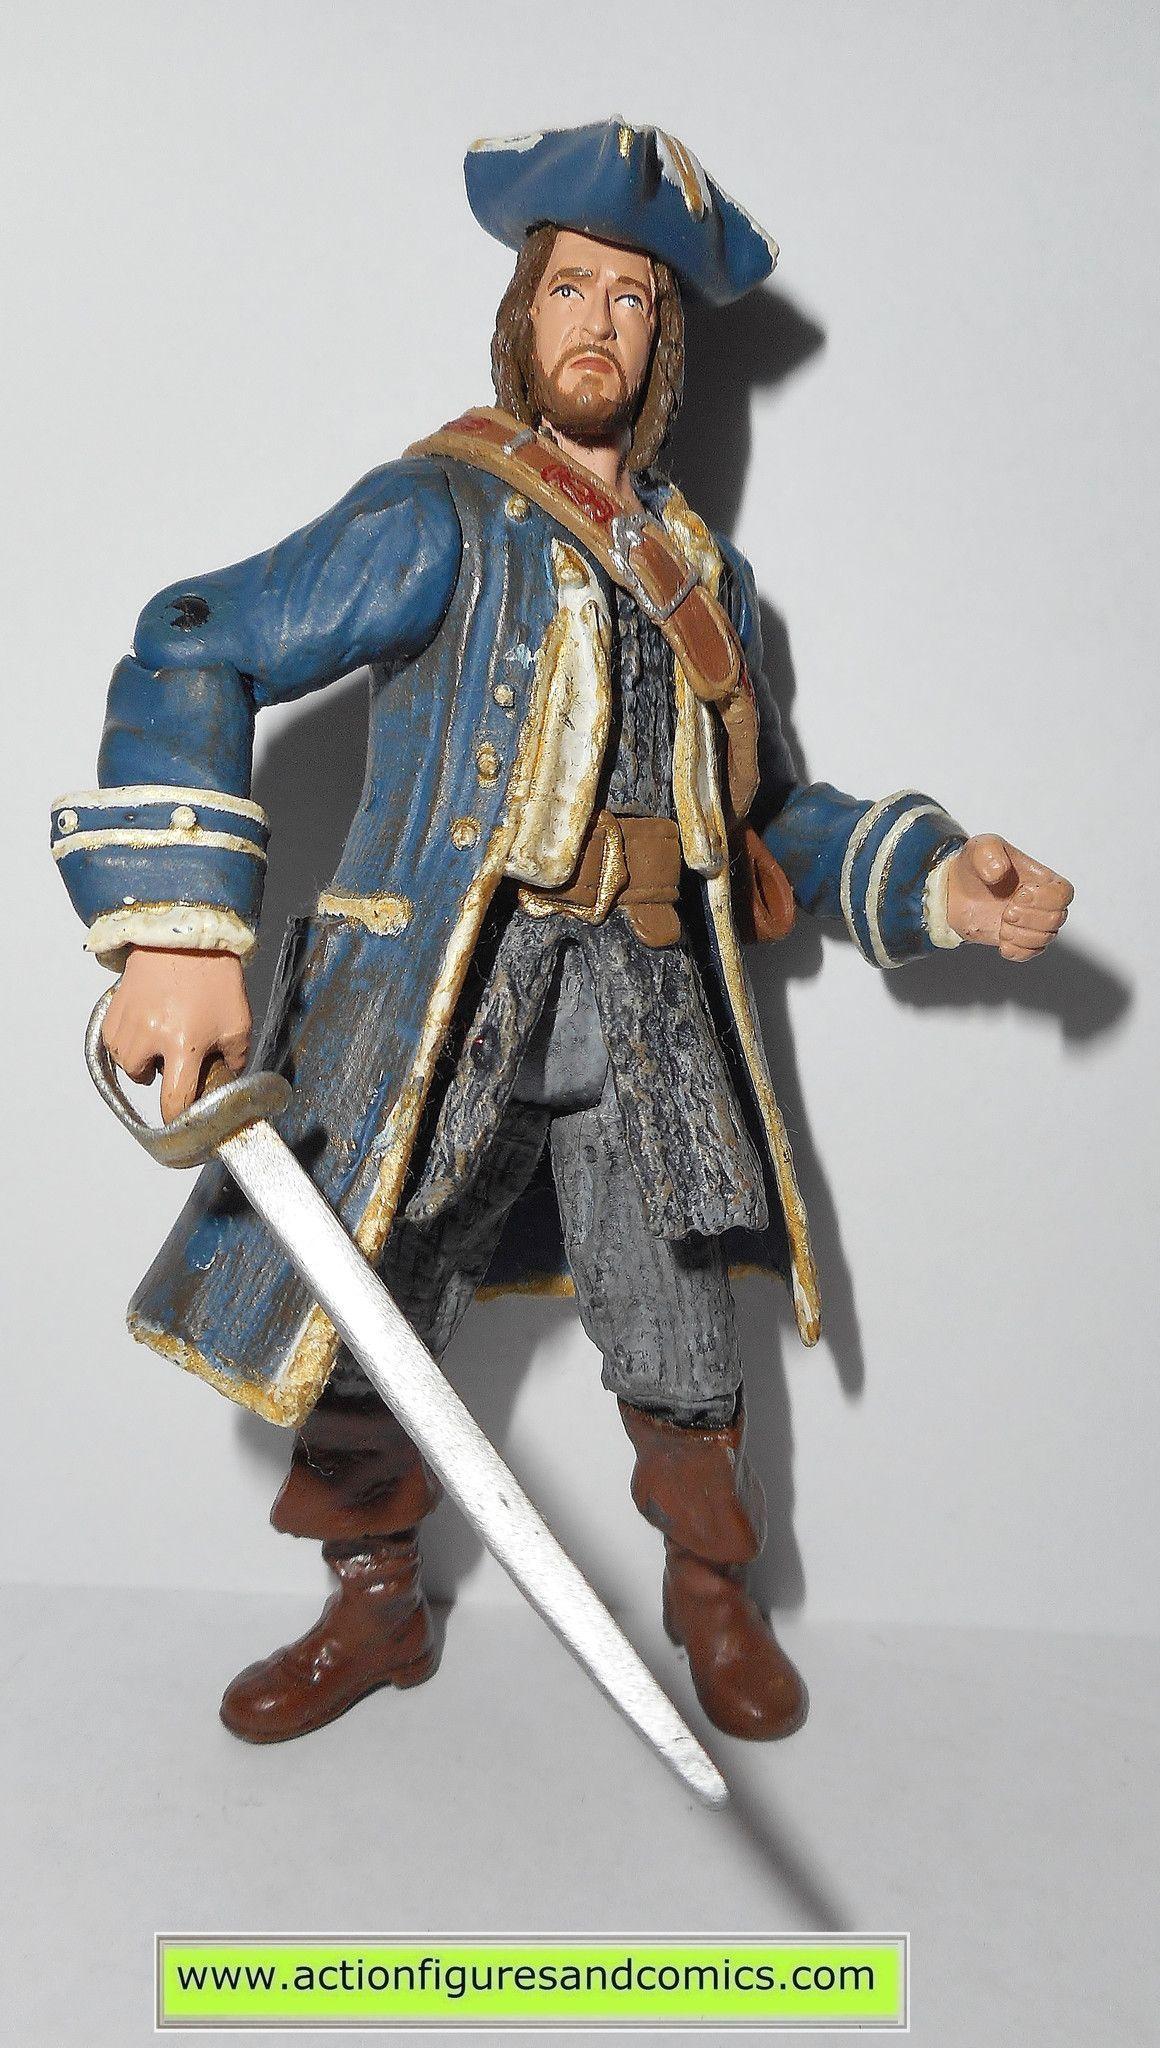 Pirates Of The Caribbean Toys : Pirates of the caribbean captain norrington zizzle